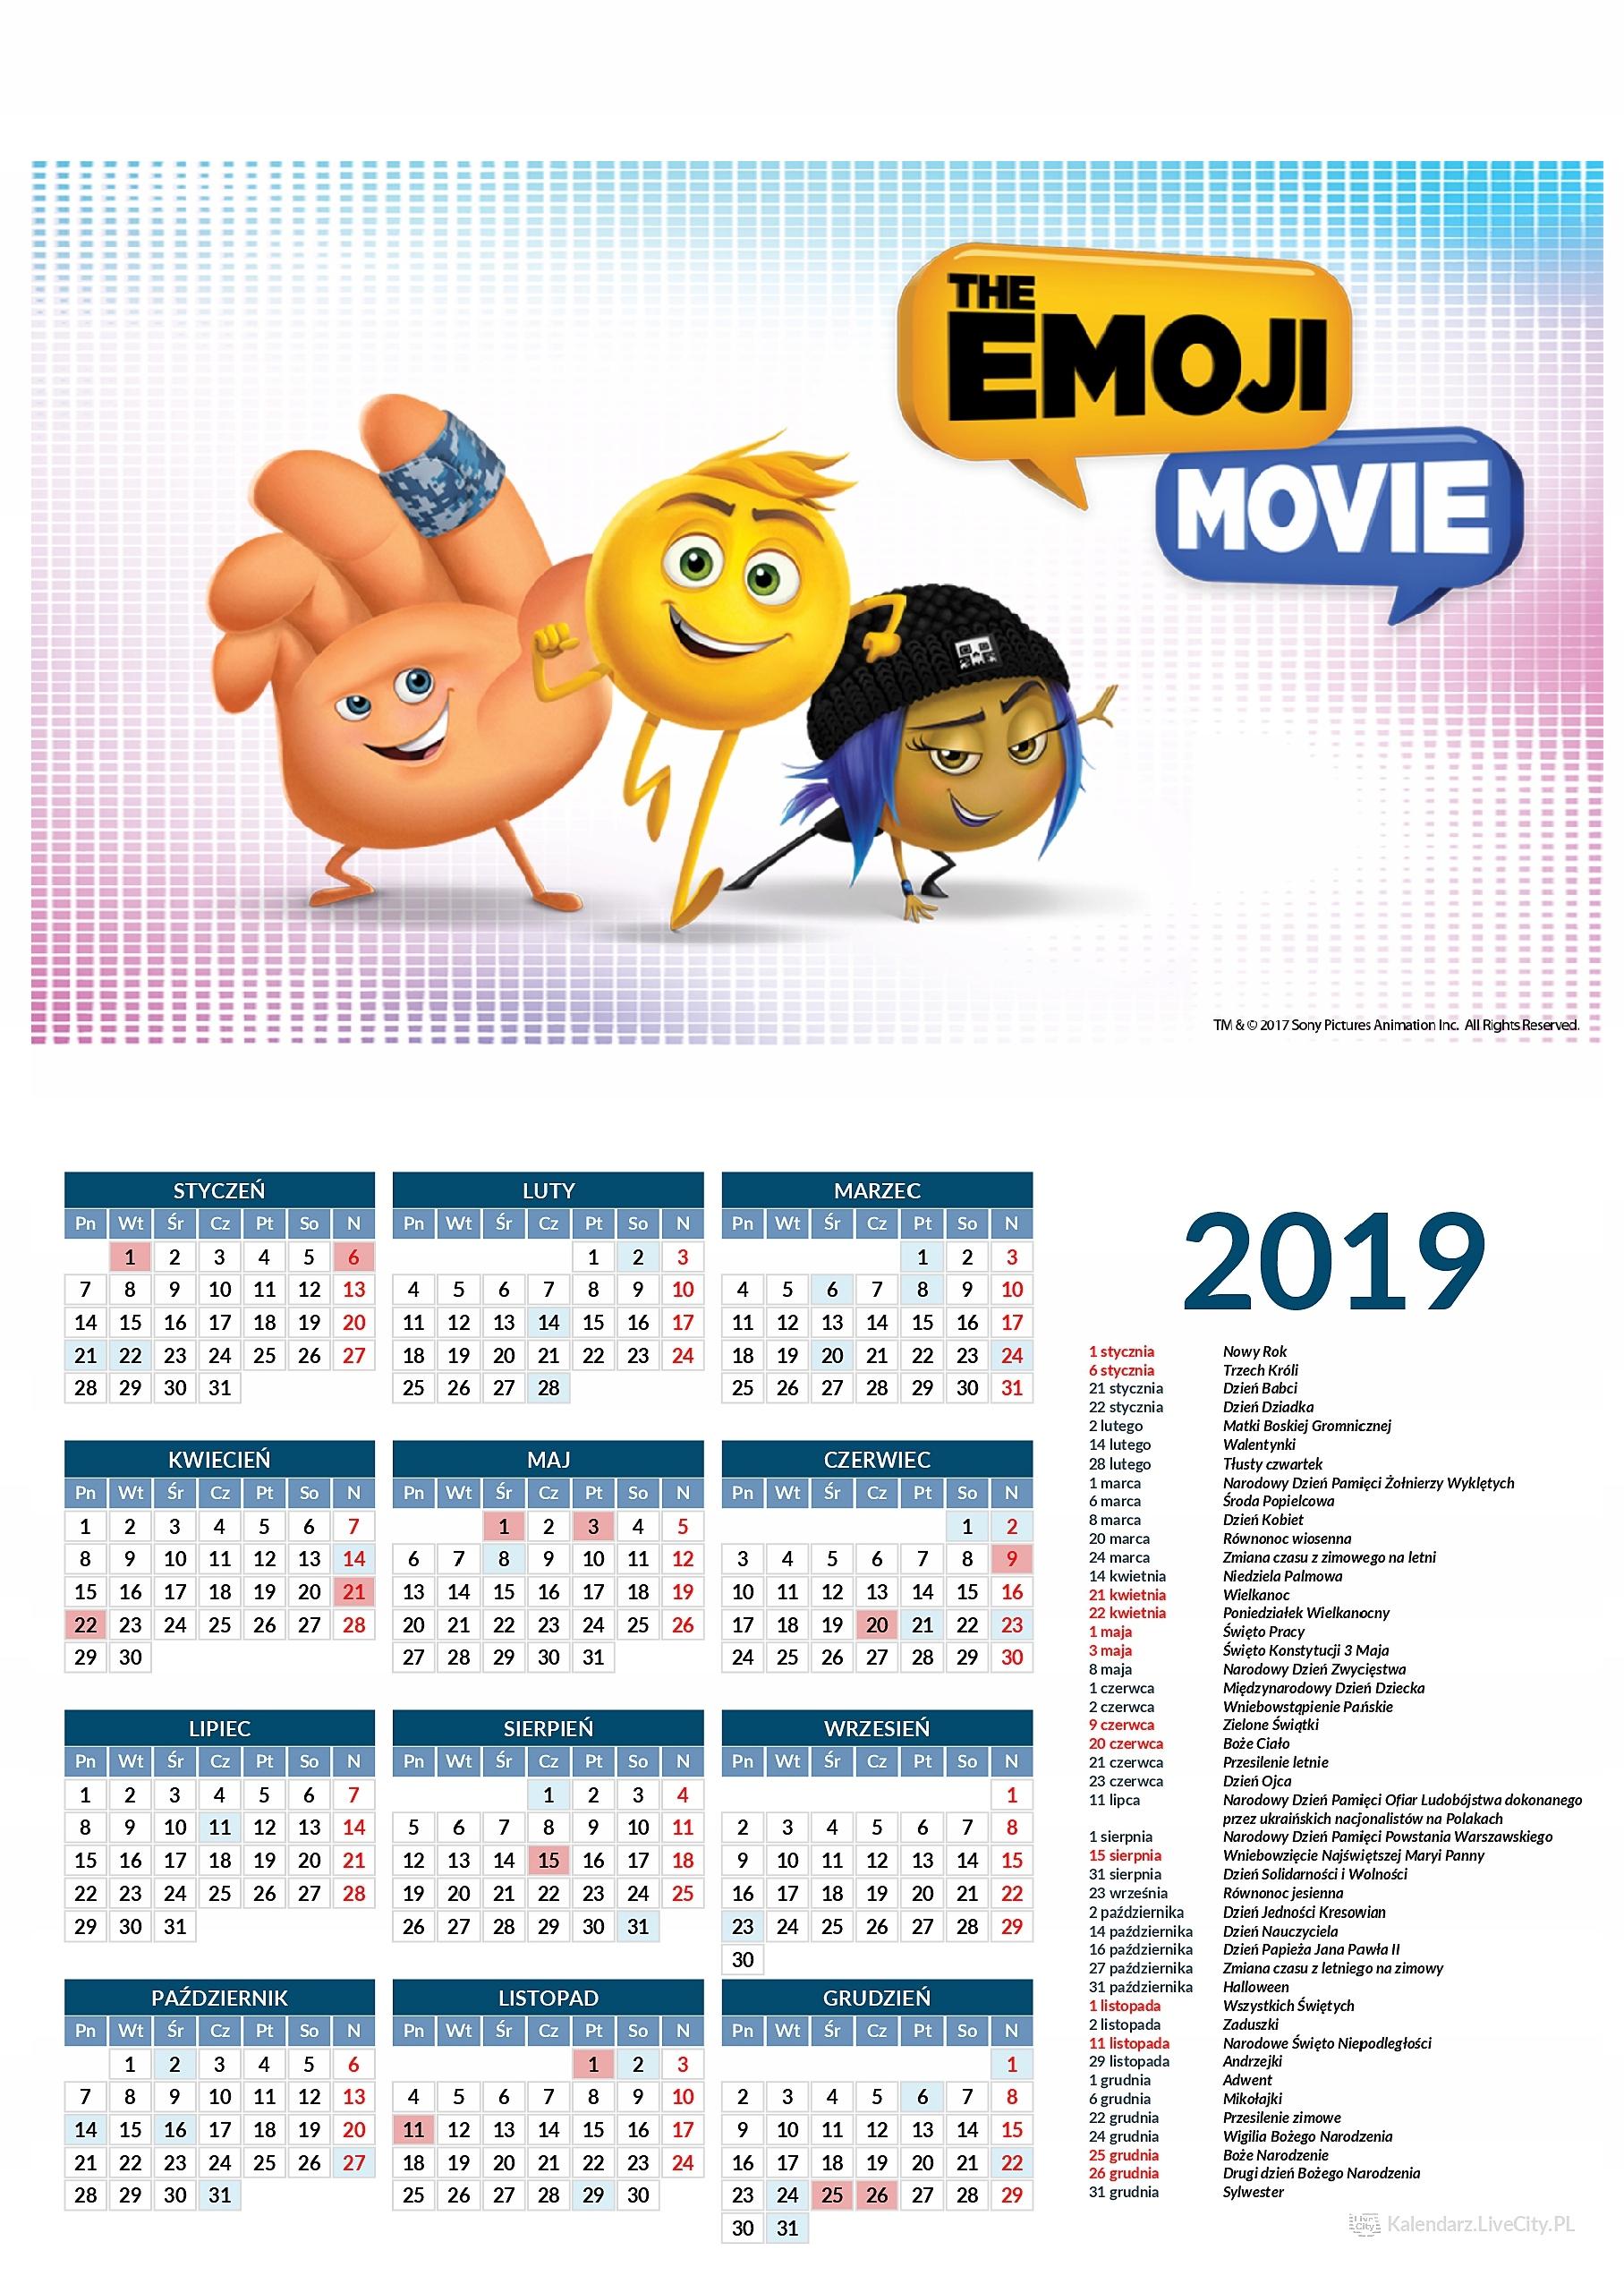 Kalendarz 2019 film the emoji movie